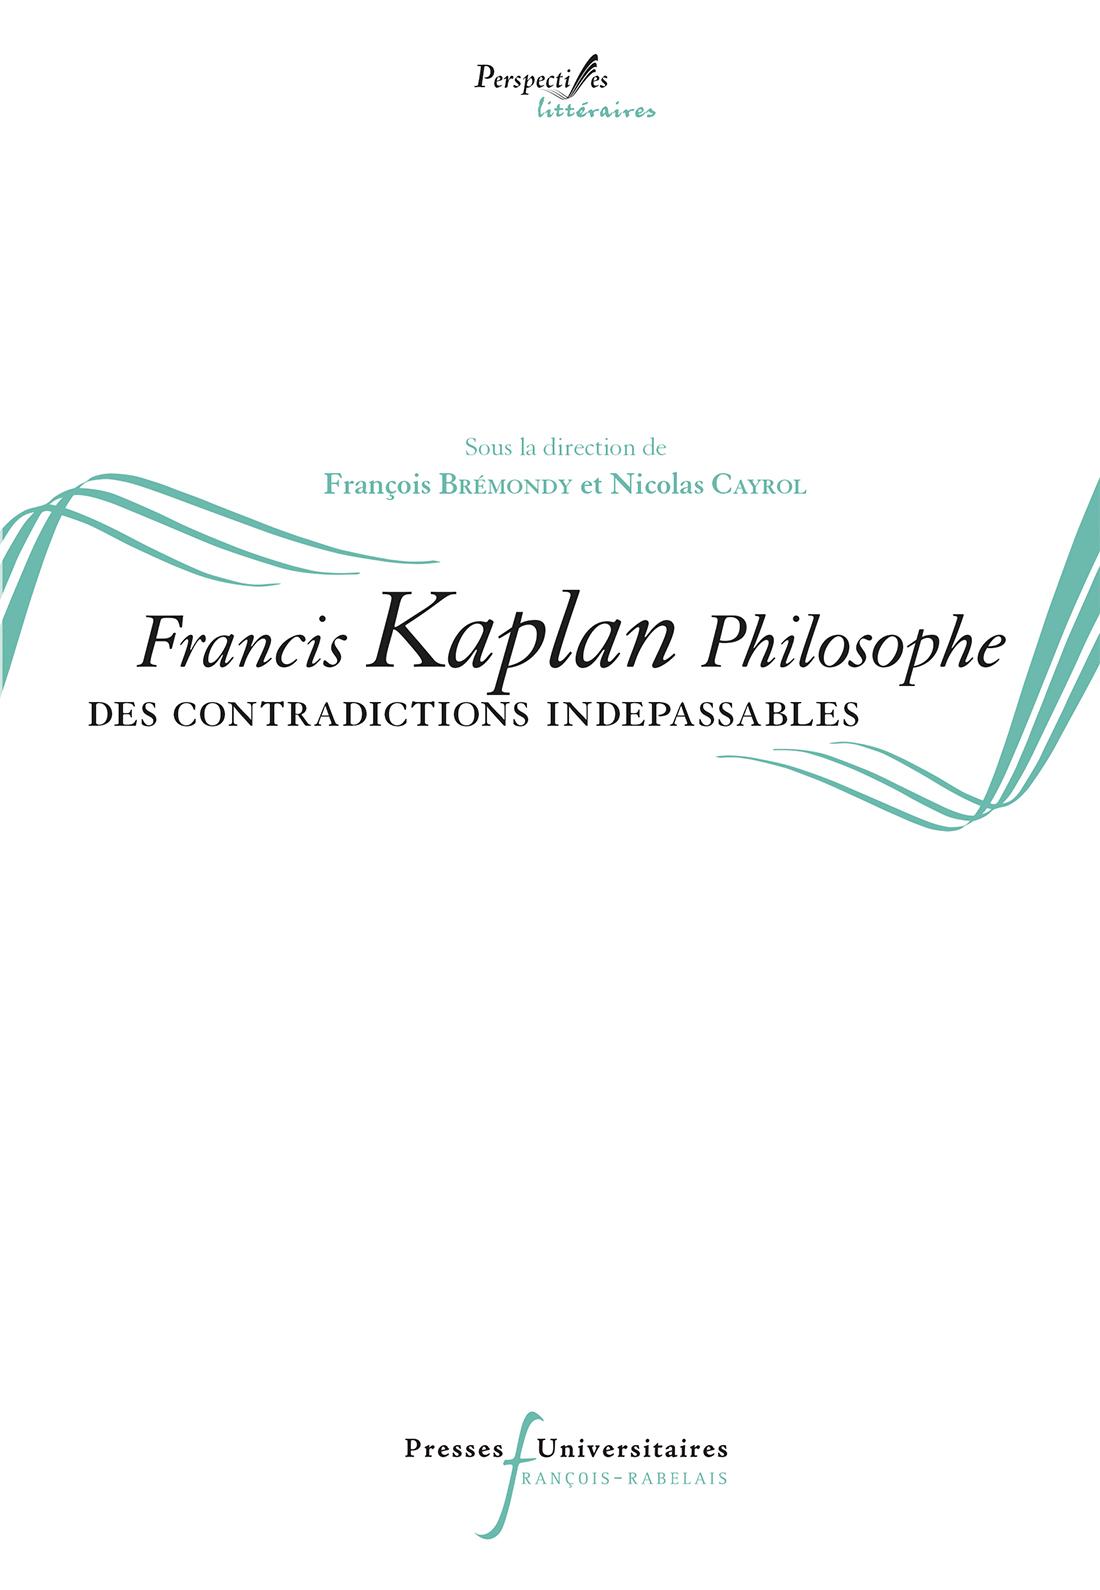 Francis Kaplan philosophe